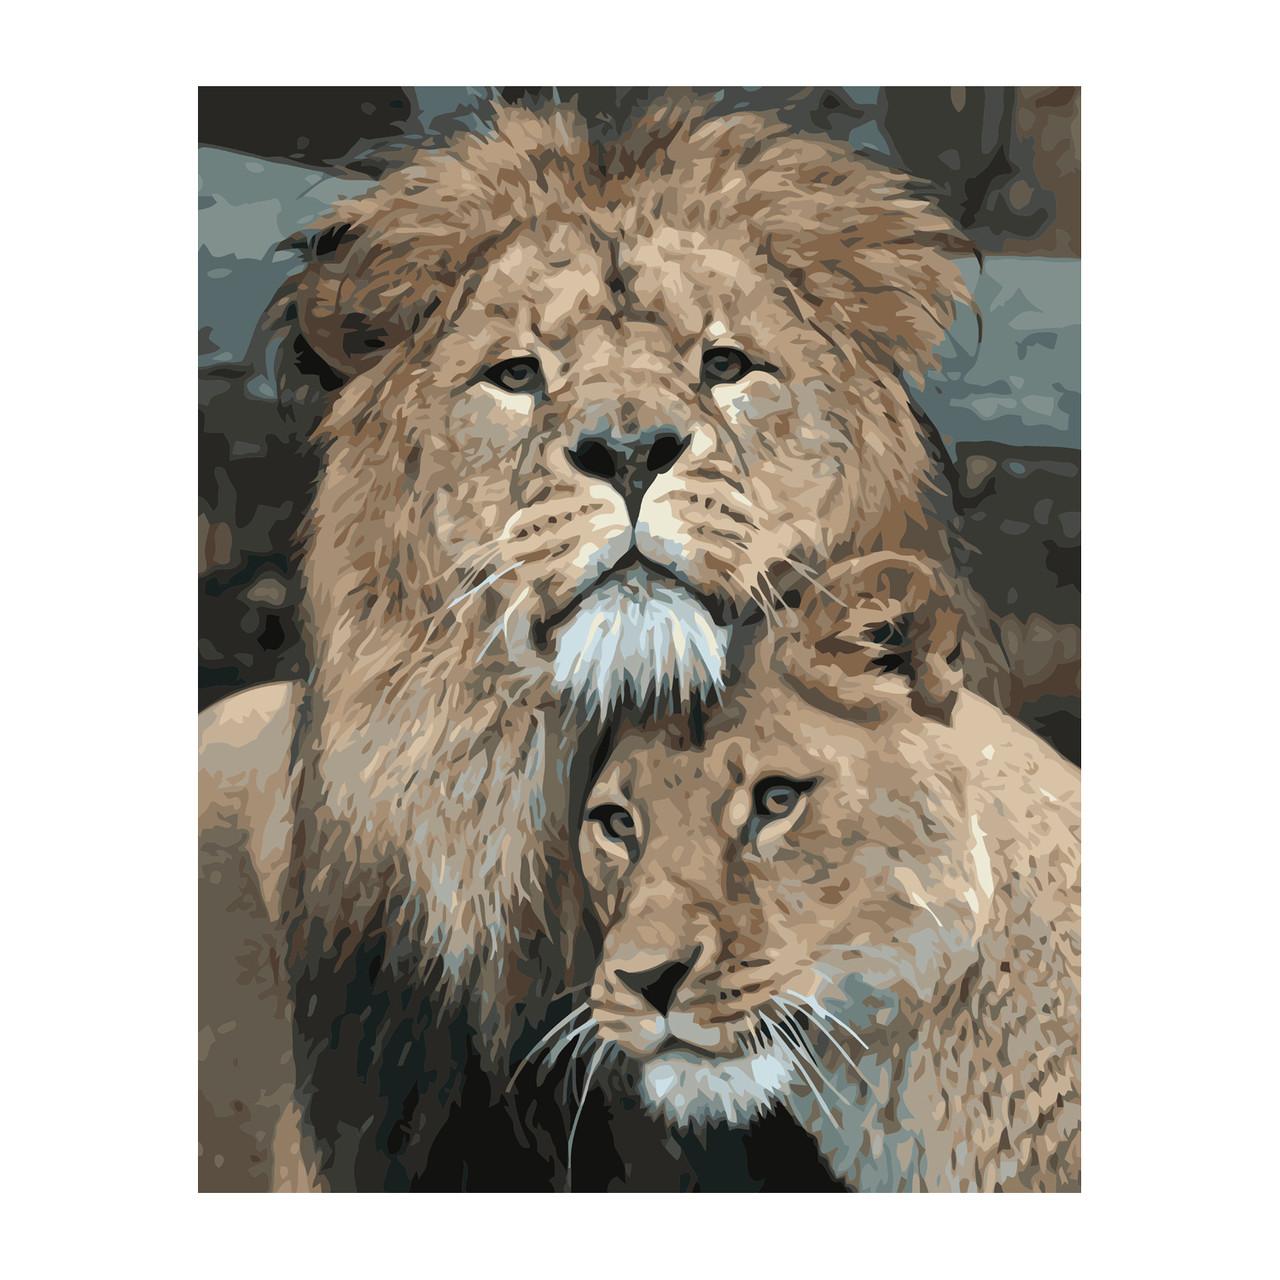 Картина по номерам Лев с львицей  Strateg 40 х 50 VA 2848